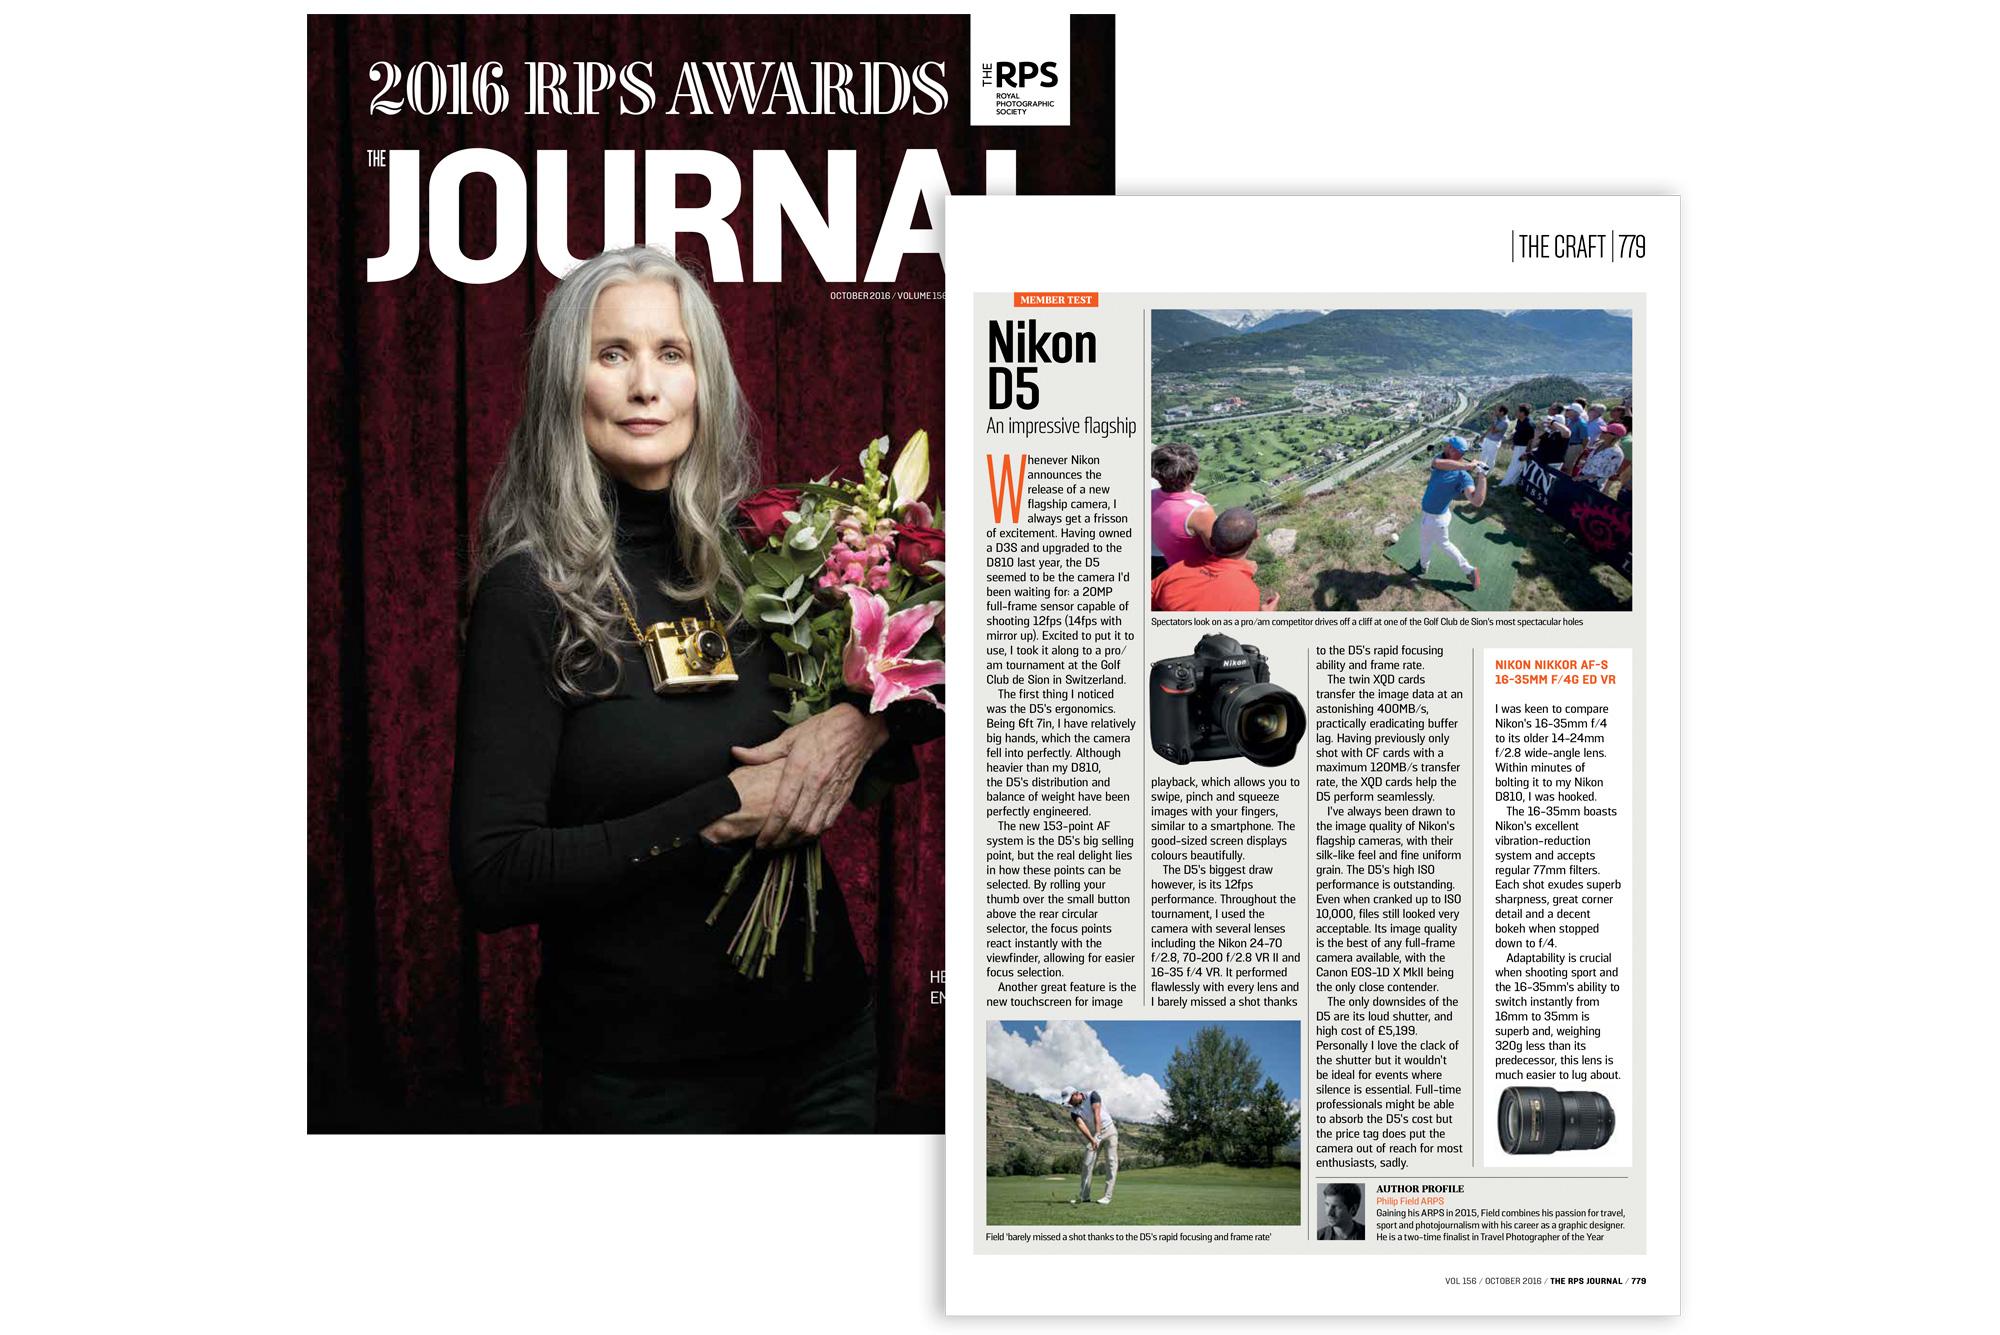 RPS Journal - October 2016 - Philip Field